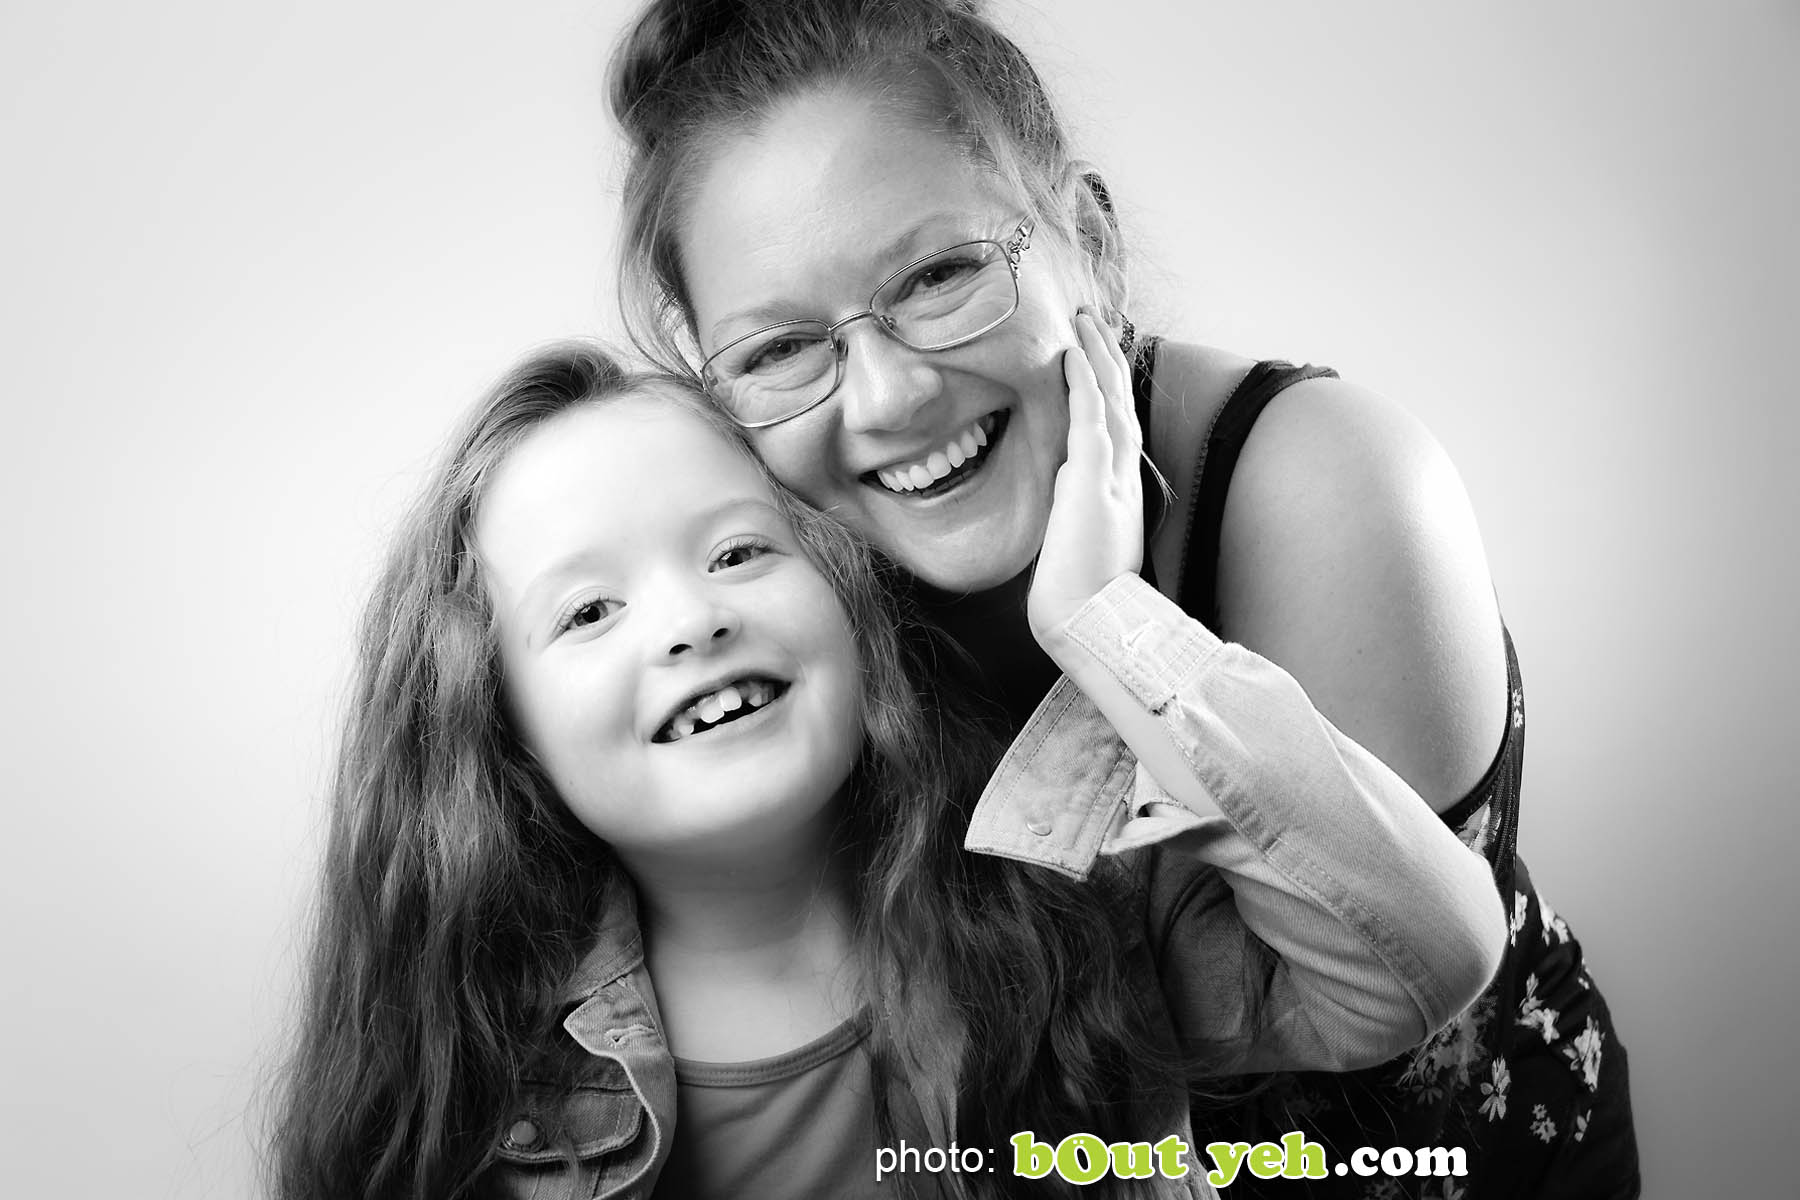 Darcey McNeeley and mum Emma, Newtownabbey. Photo 4972